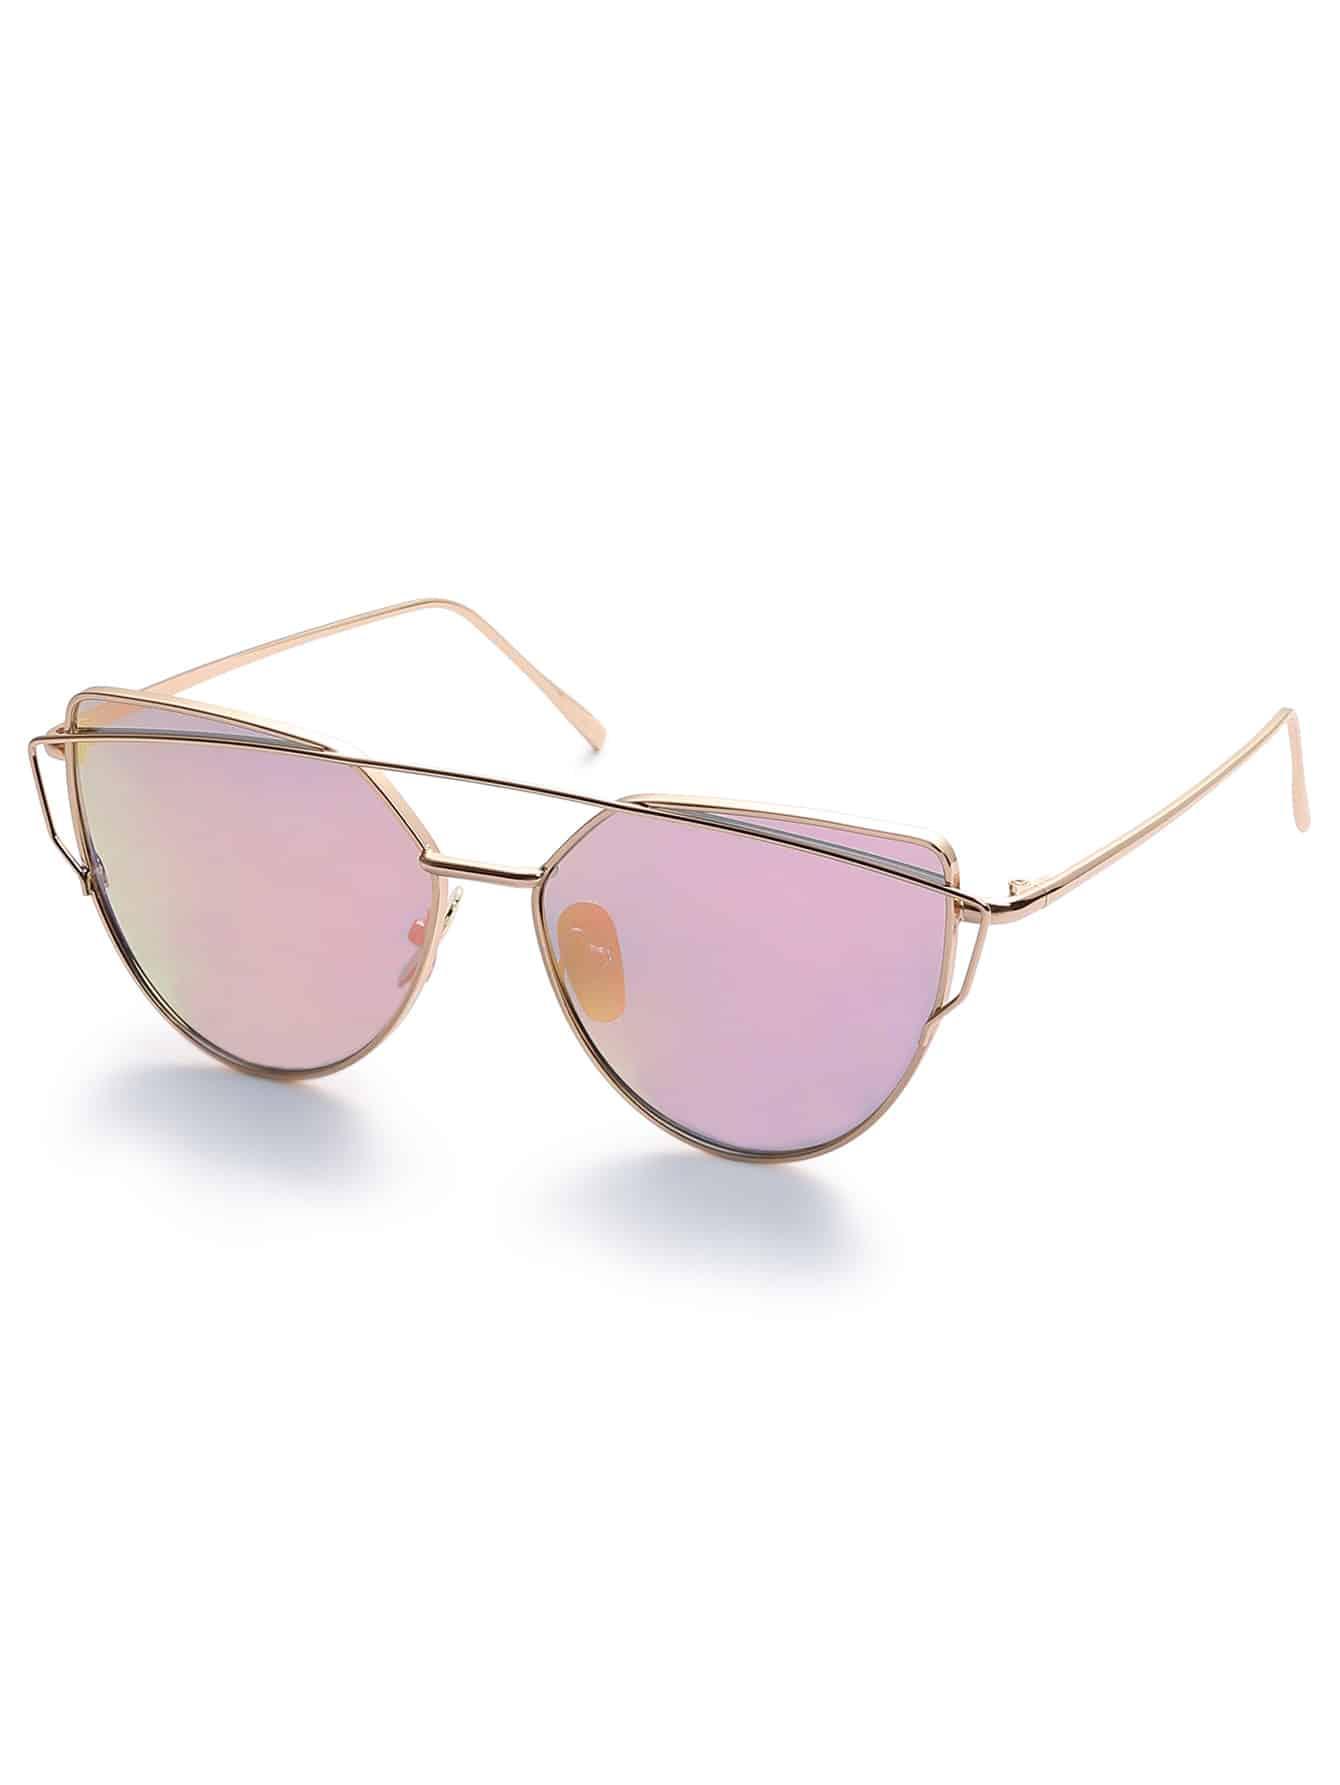 Gold Metal Frame Double Bridge Pink Lens Sunglasses